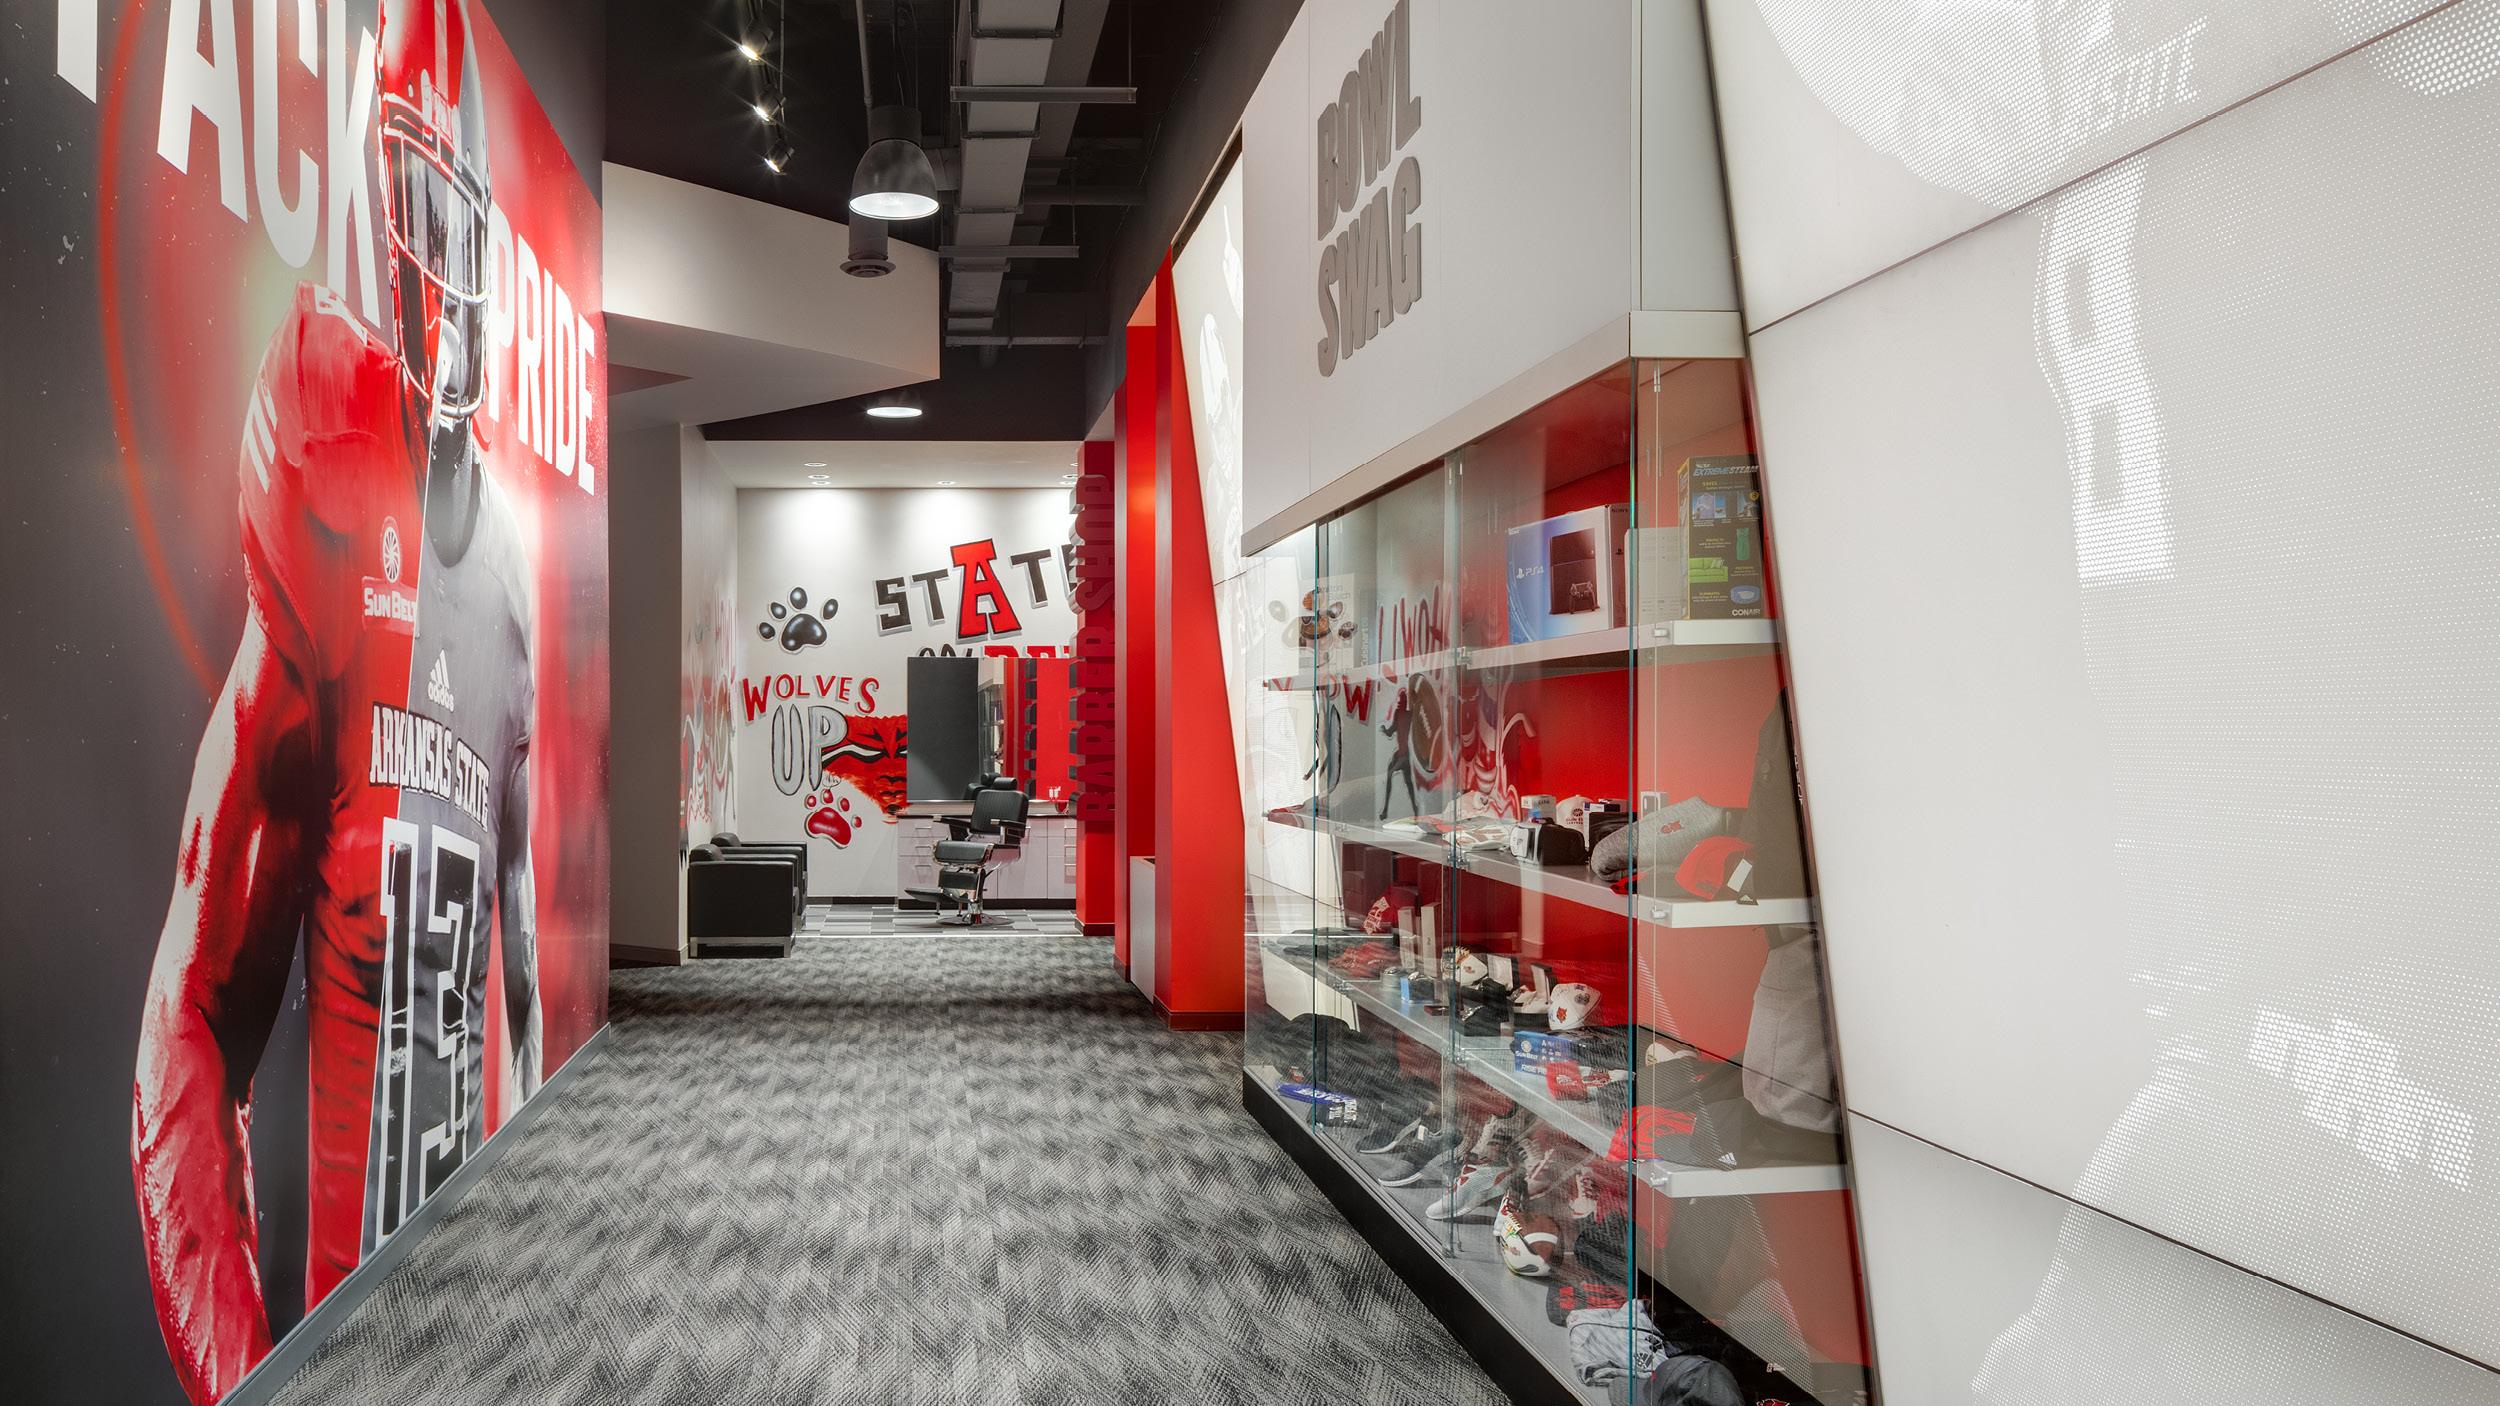 ASU Football opps inside barber shop